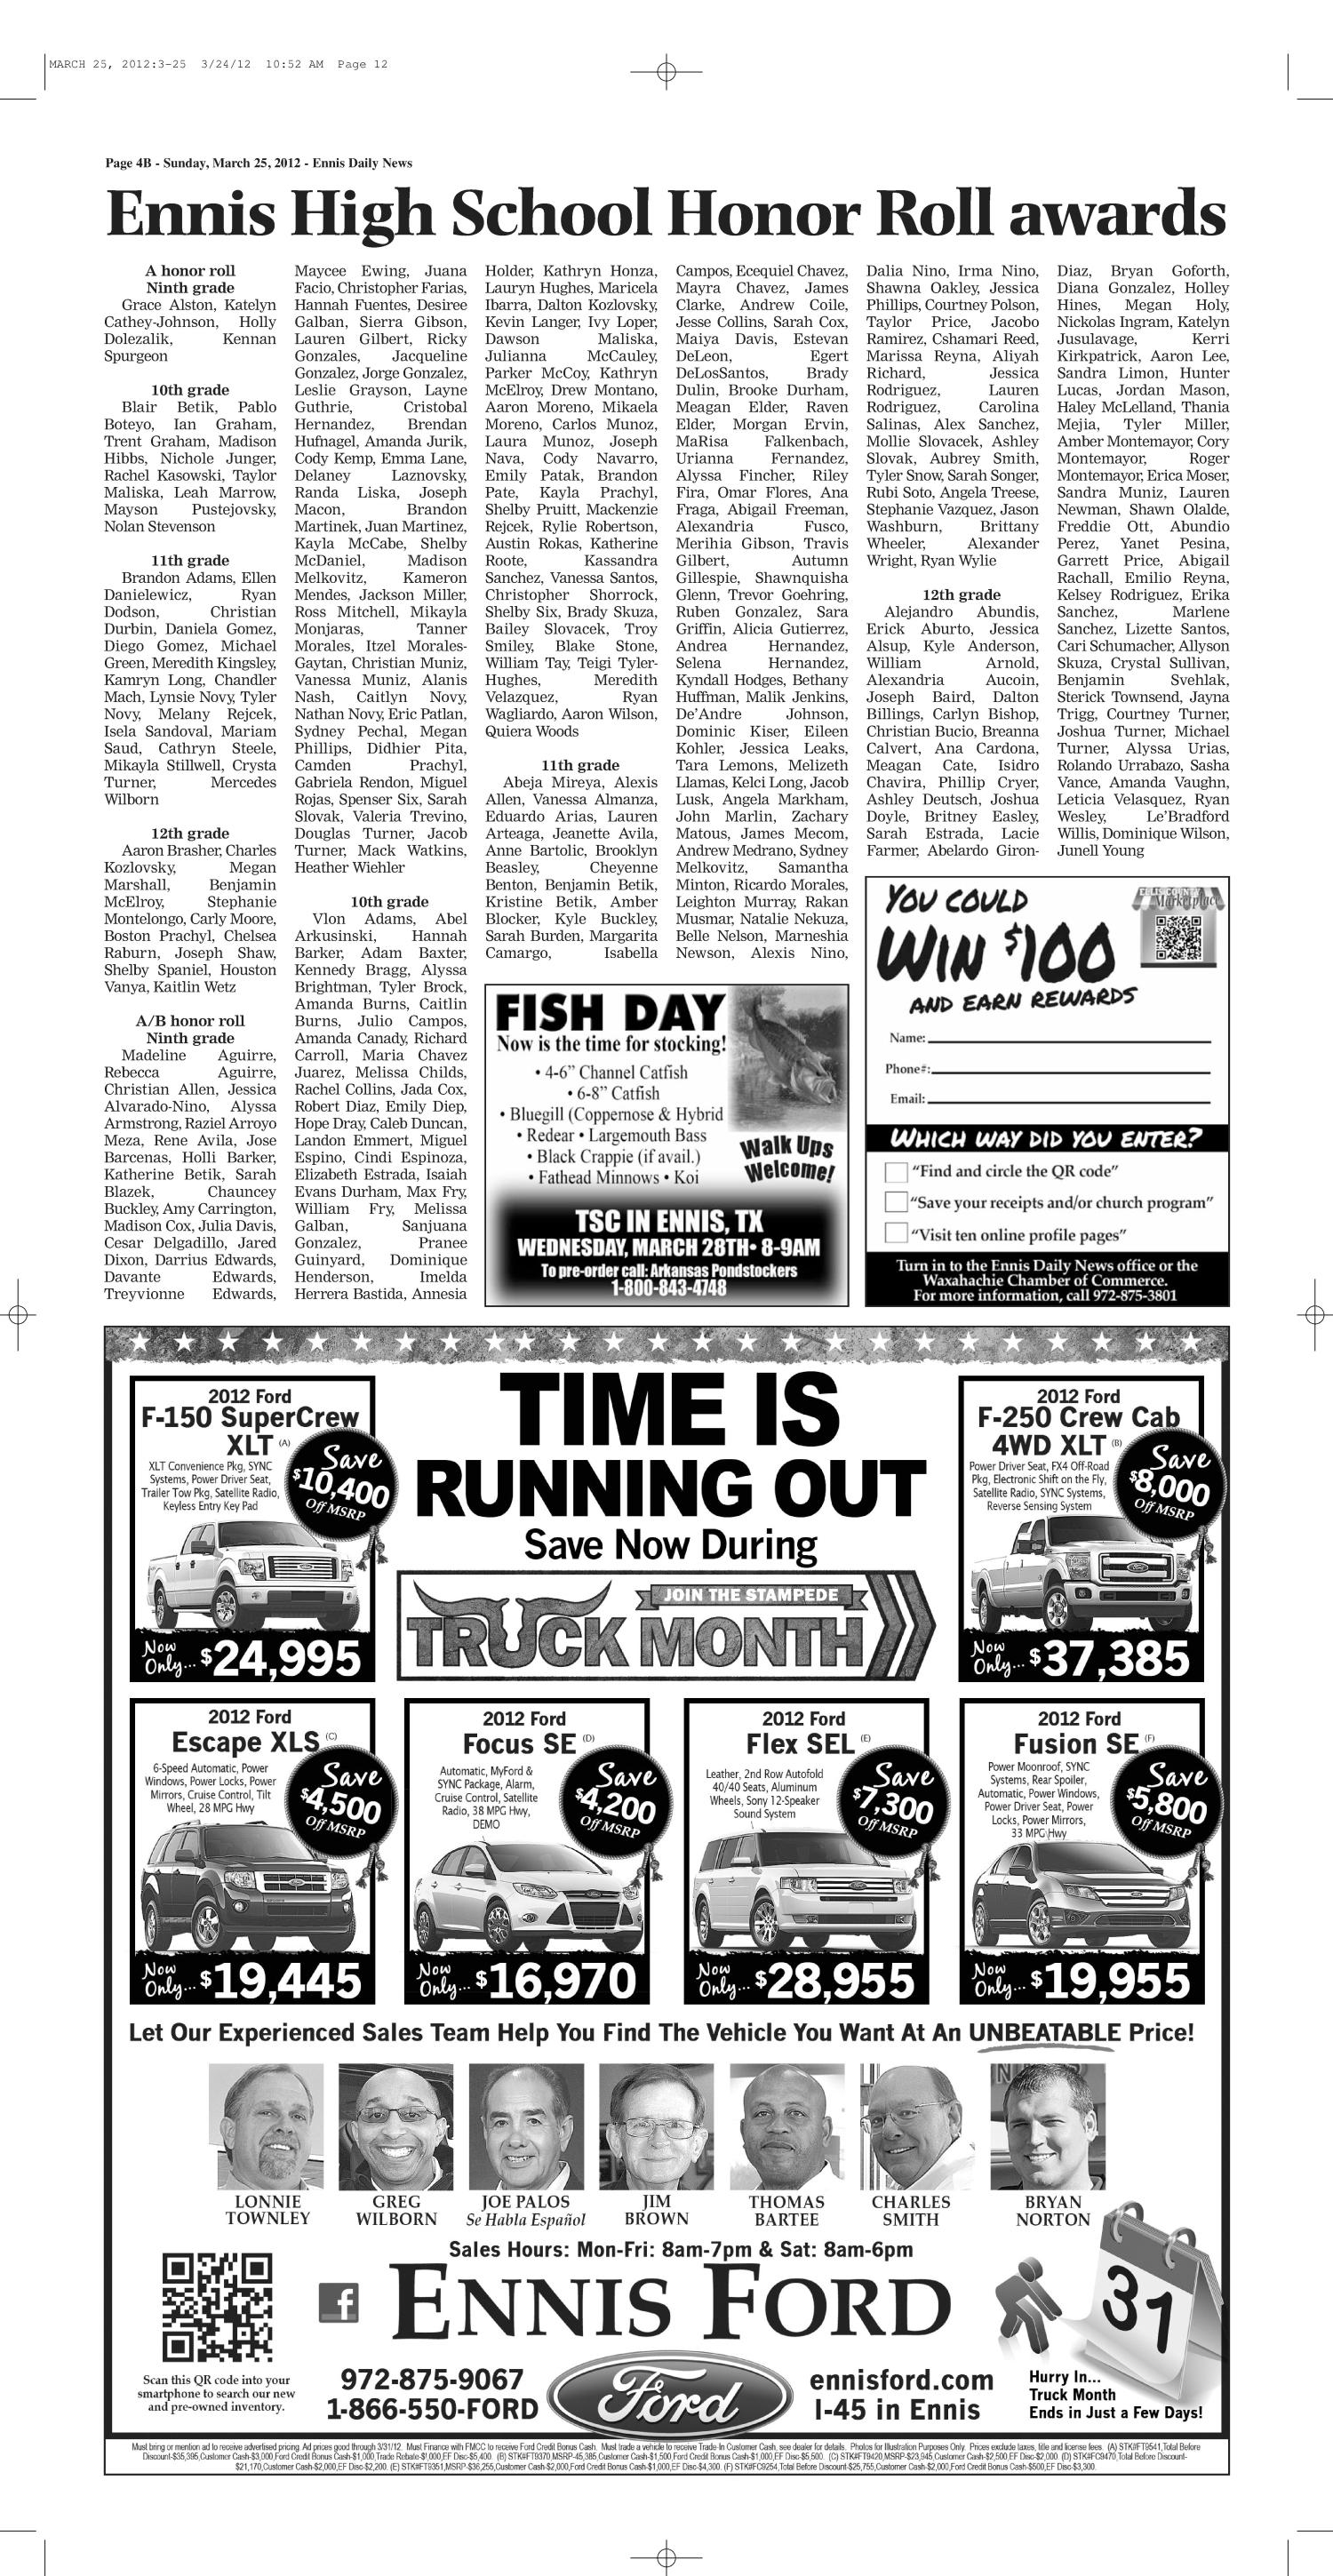 The Ennis Daily News (Ennis, Tex.), Ed. 1 Sunday, March 25, 2012 ...